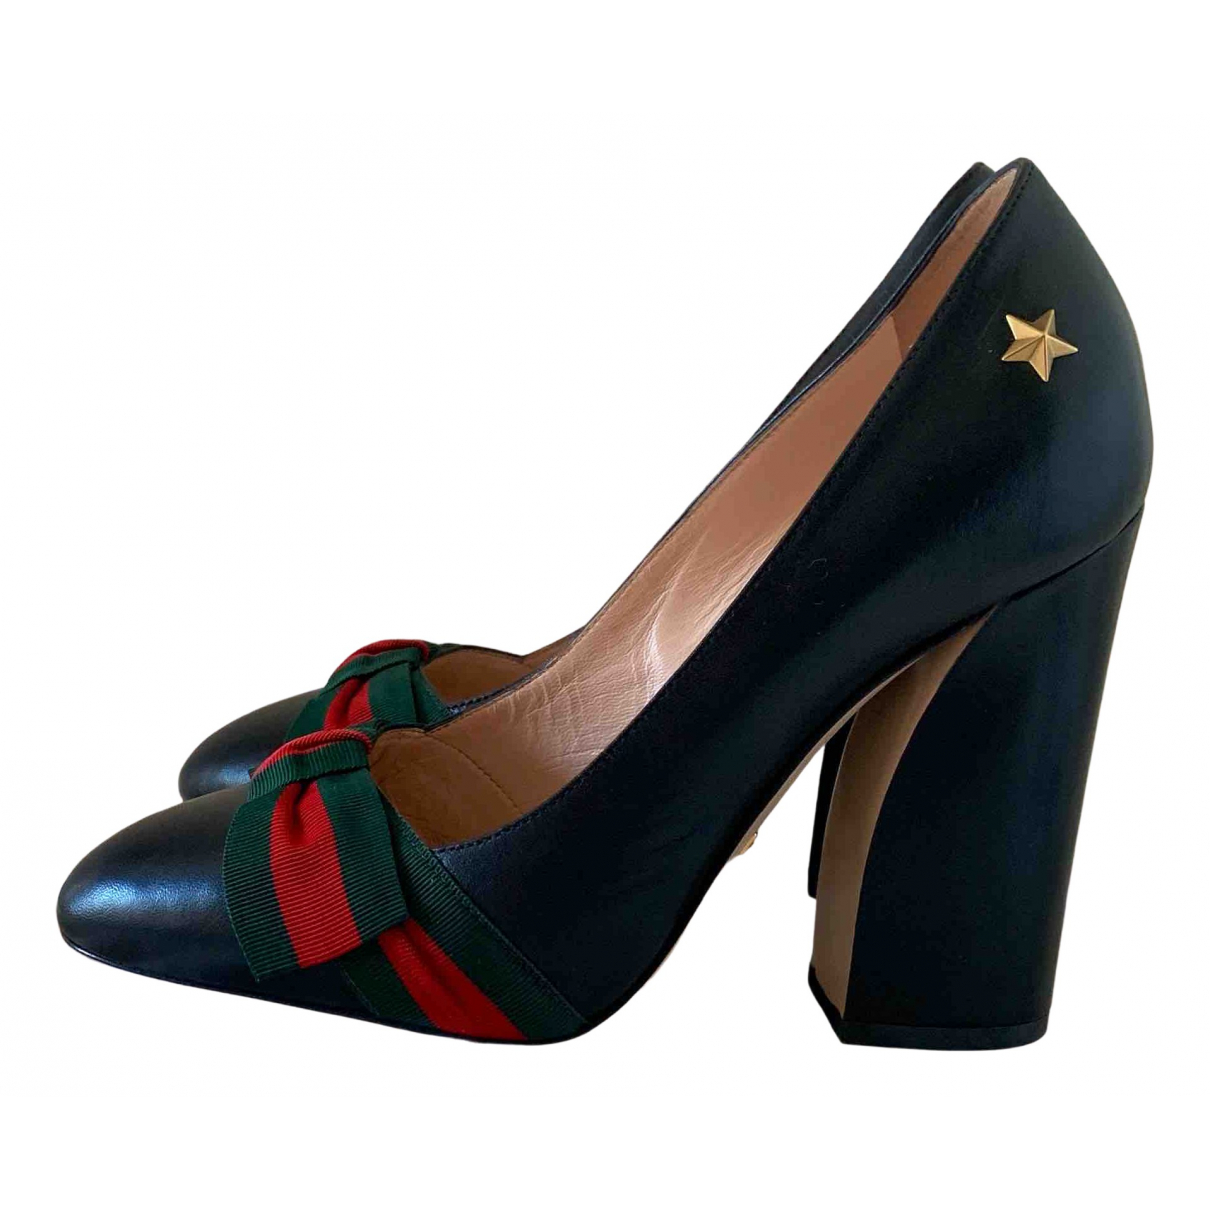 Gucci Sylvie Black Leather Heels for Women 37.5 EU